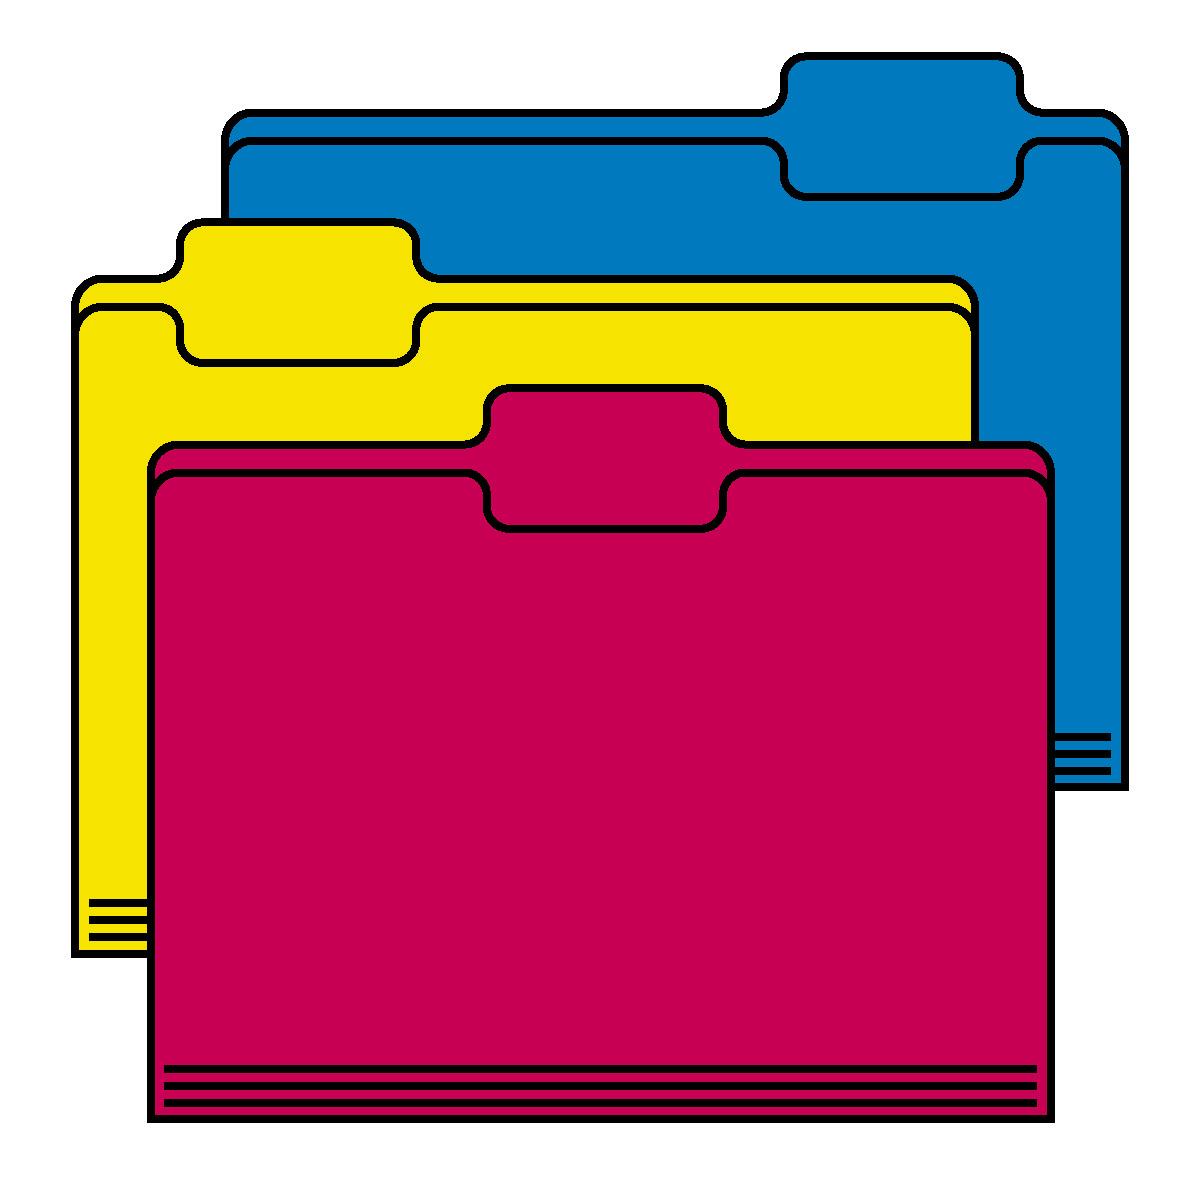 School Folder Clip Art | Clipart Panda - Free Clipart Images